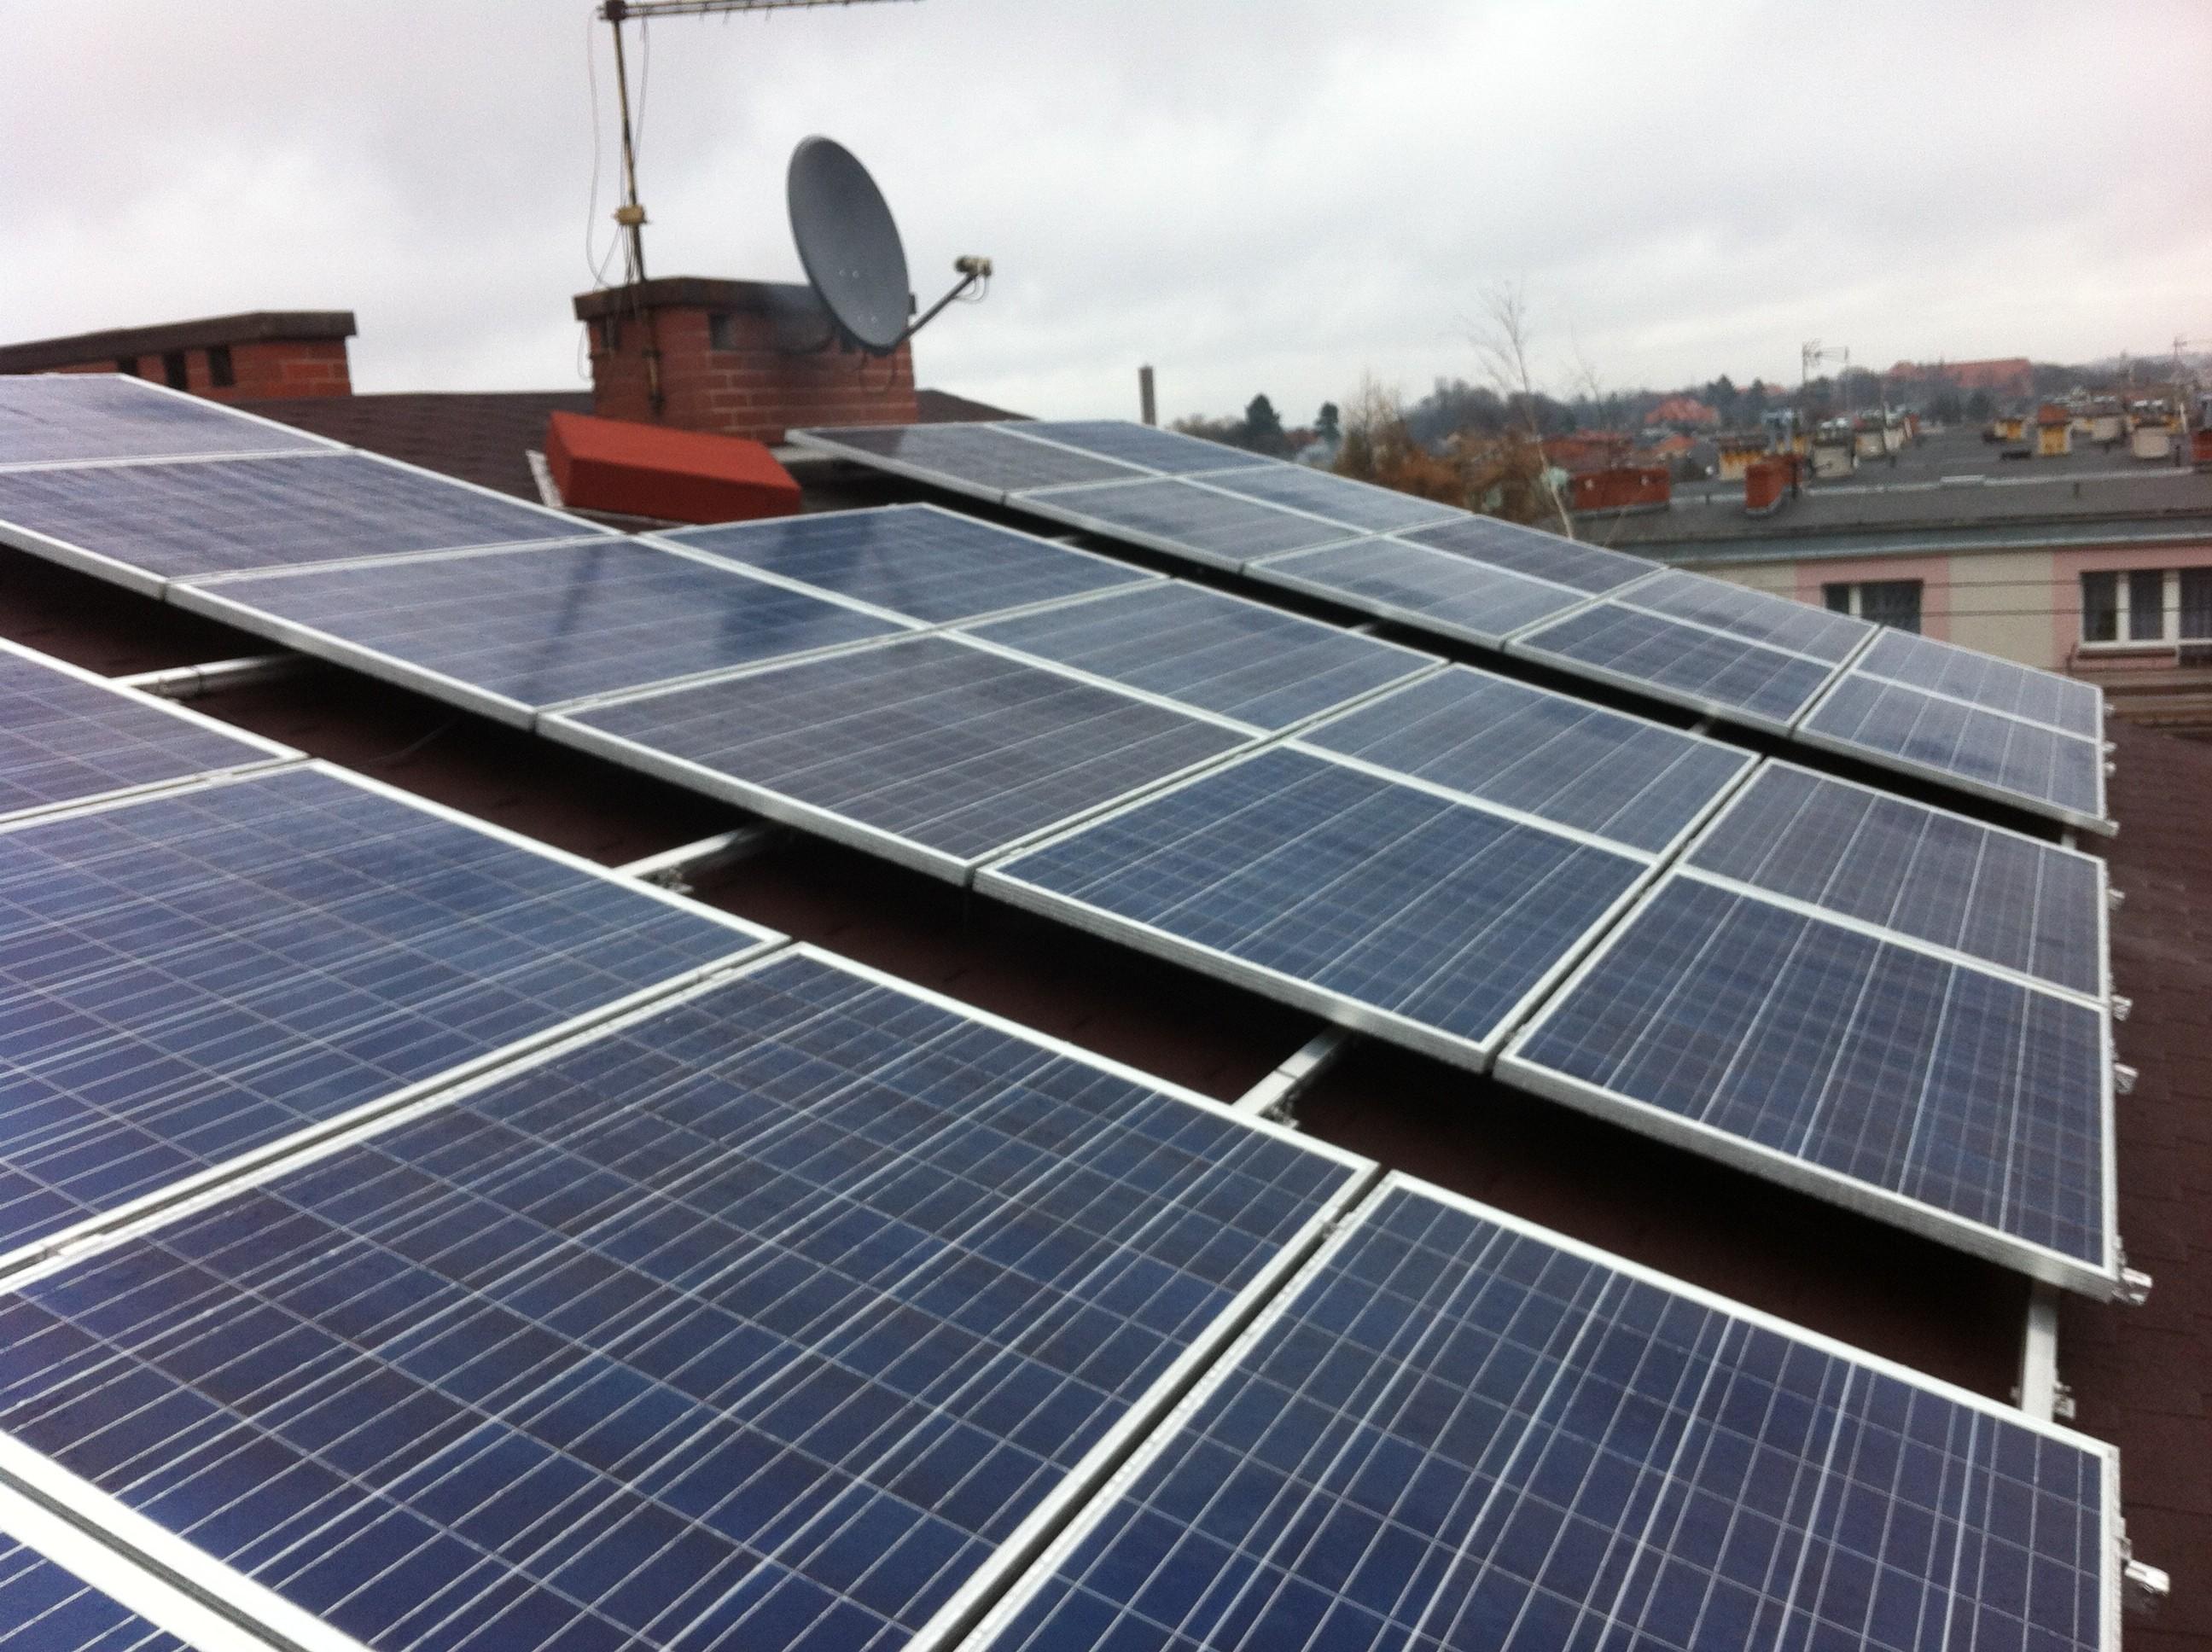 Tarnowskie Góry - Moc 8 kWp On-grid